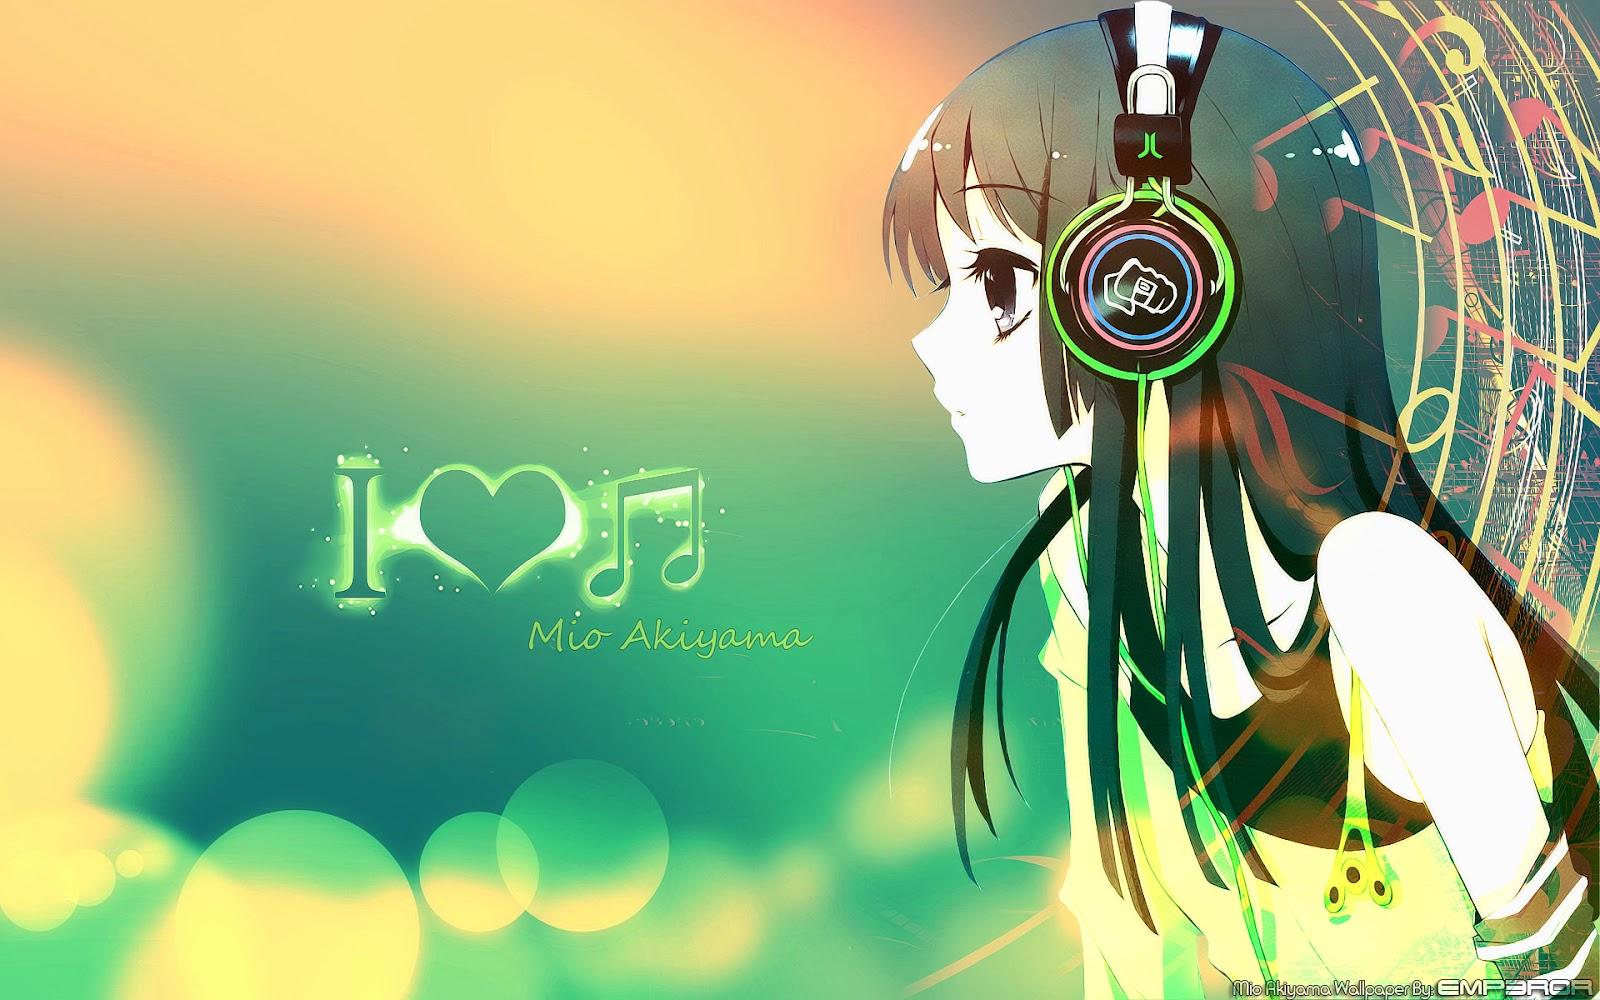 http://4.bp.blogspot.com/-08_6hv7uPbA/T_Y3GgiAjKI/AAAAAAAAABY/83fXA9L3dd8/s1600/mio_akiyama_wallpaper_by_emp3r0r007-d4ibca5.jpg